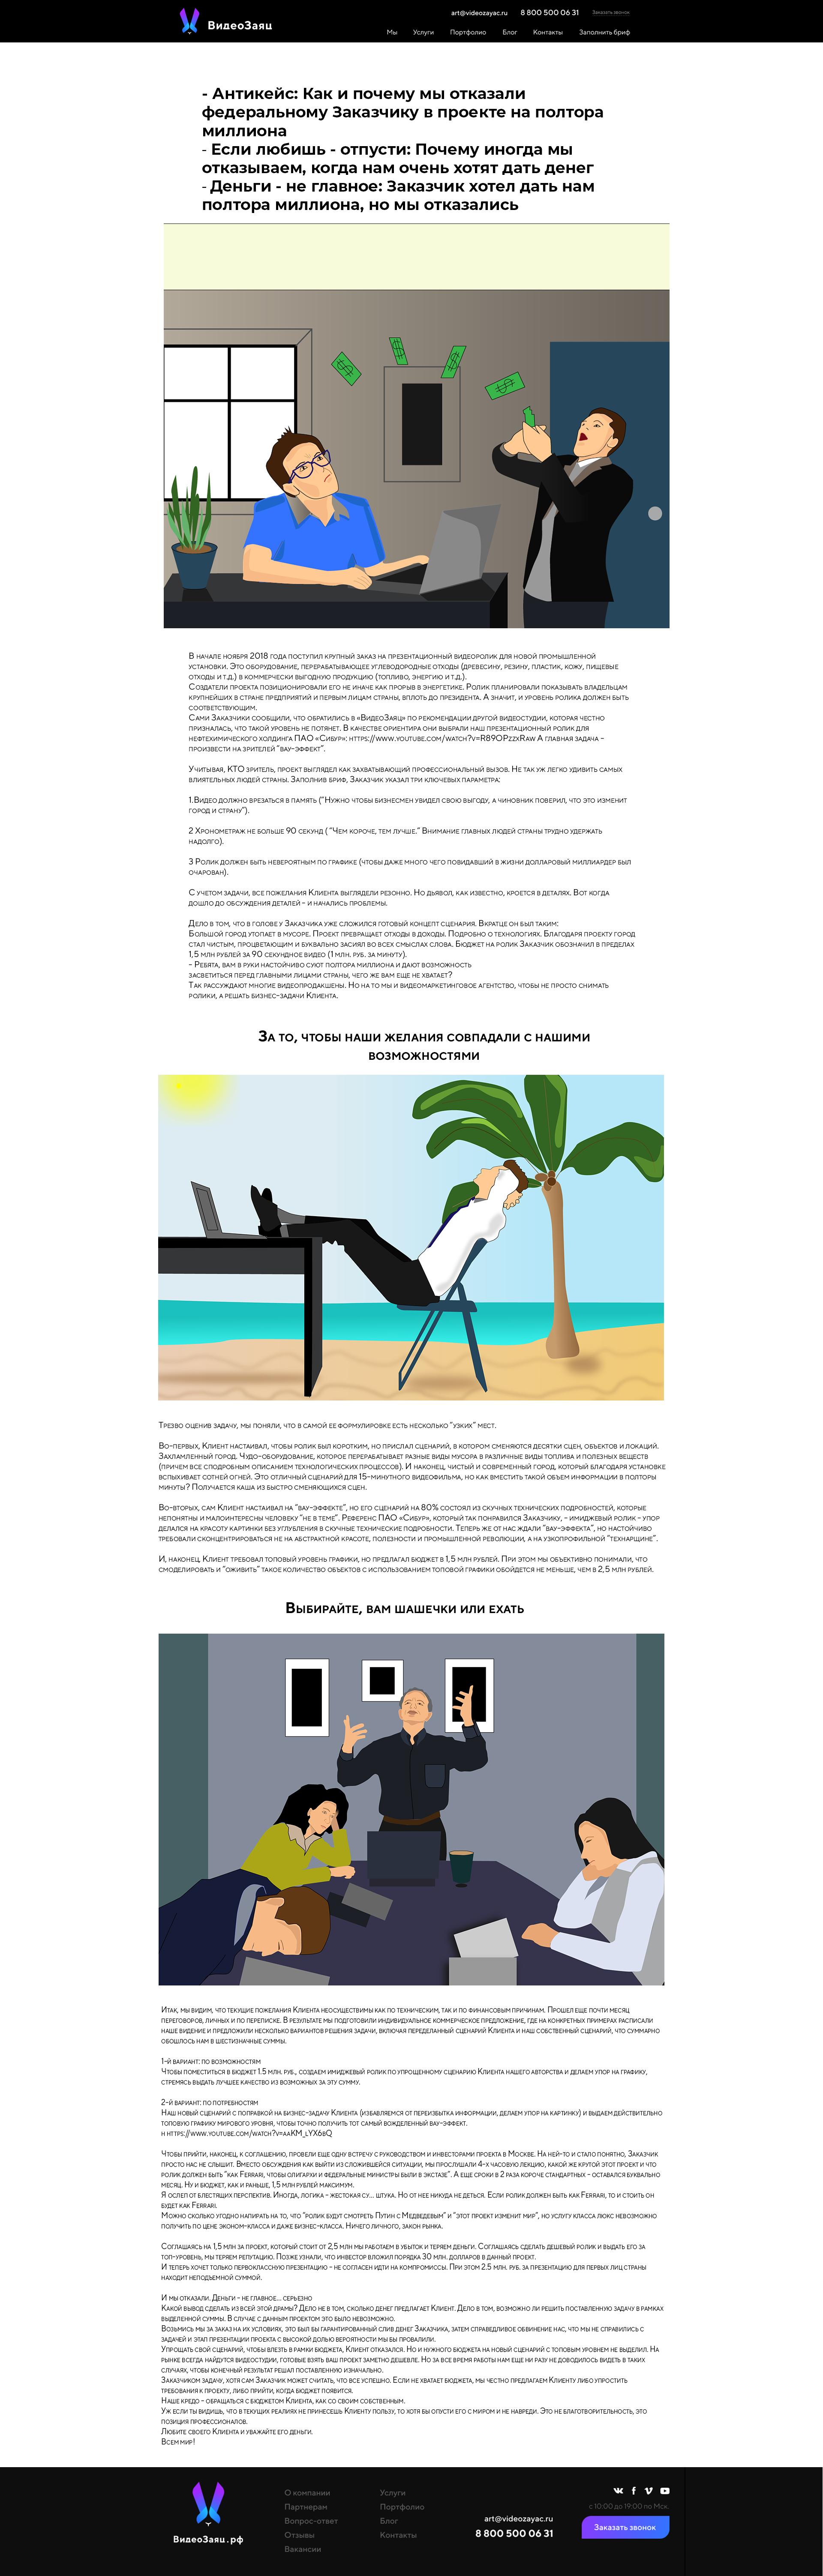 Дизайн иллюстраций блога компании ВидеоЗаяц.рф фото f_0655dd2379eba07e.png